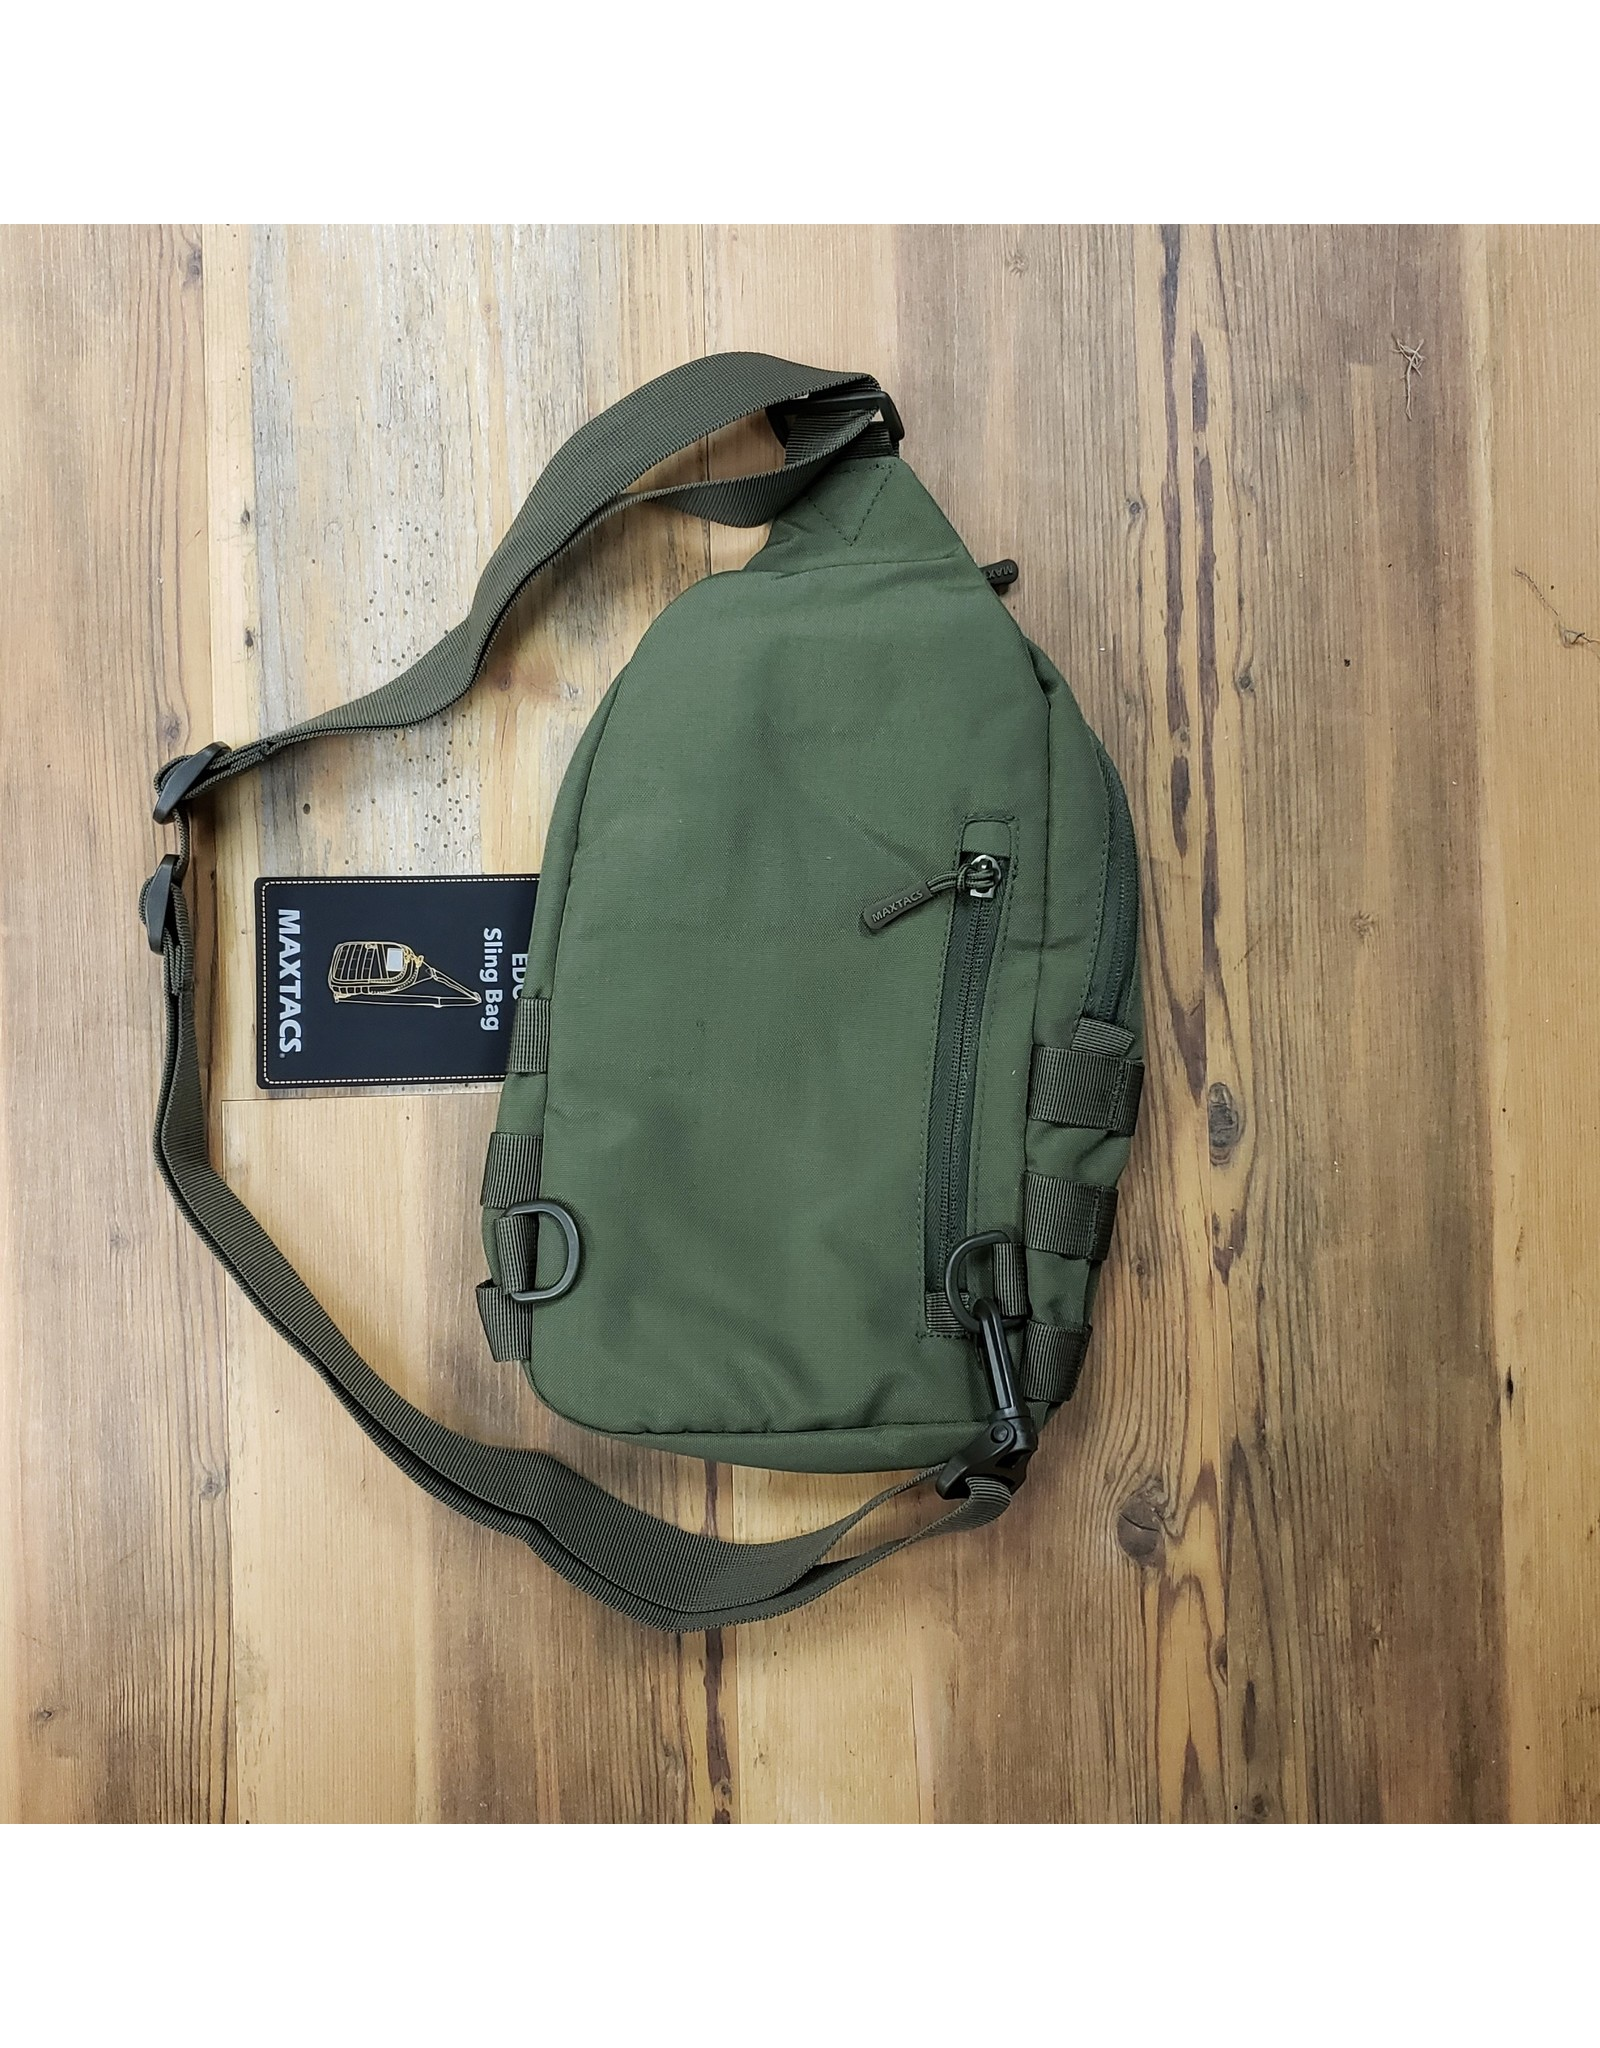 MAXTACS EDC Sling Bag OLG 120005